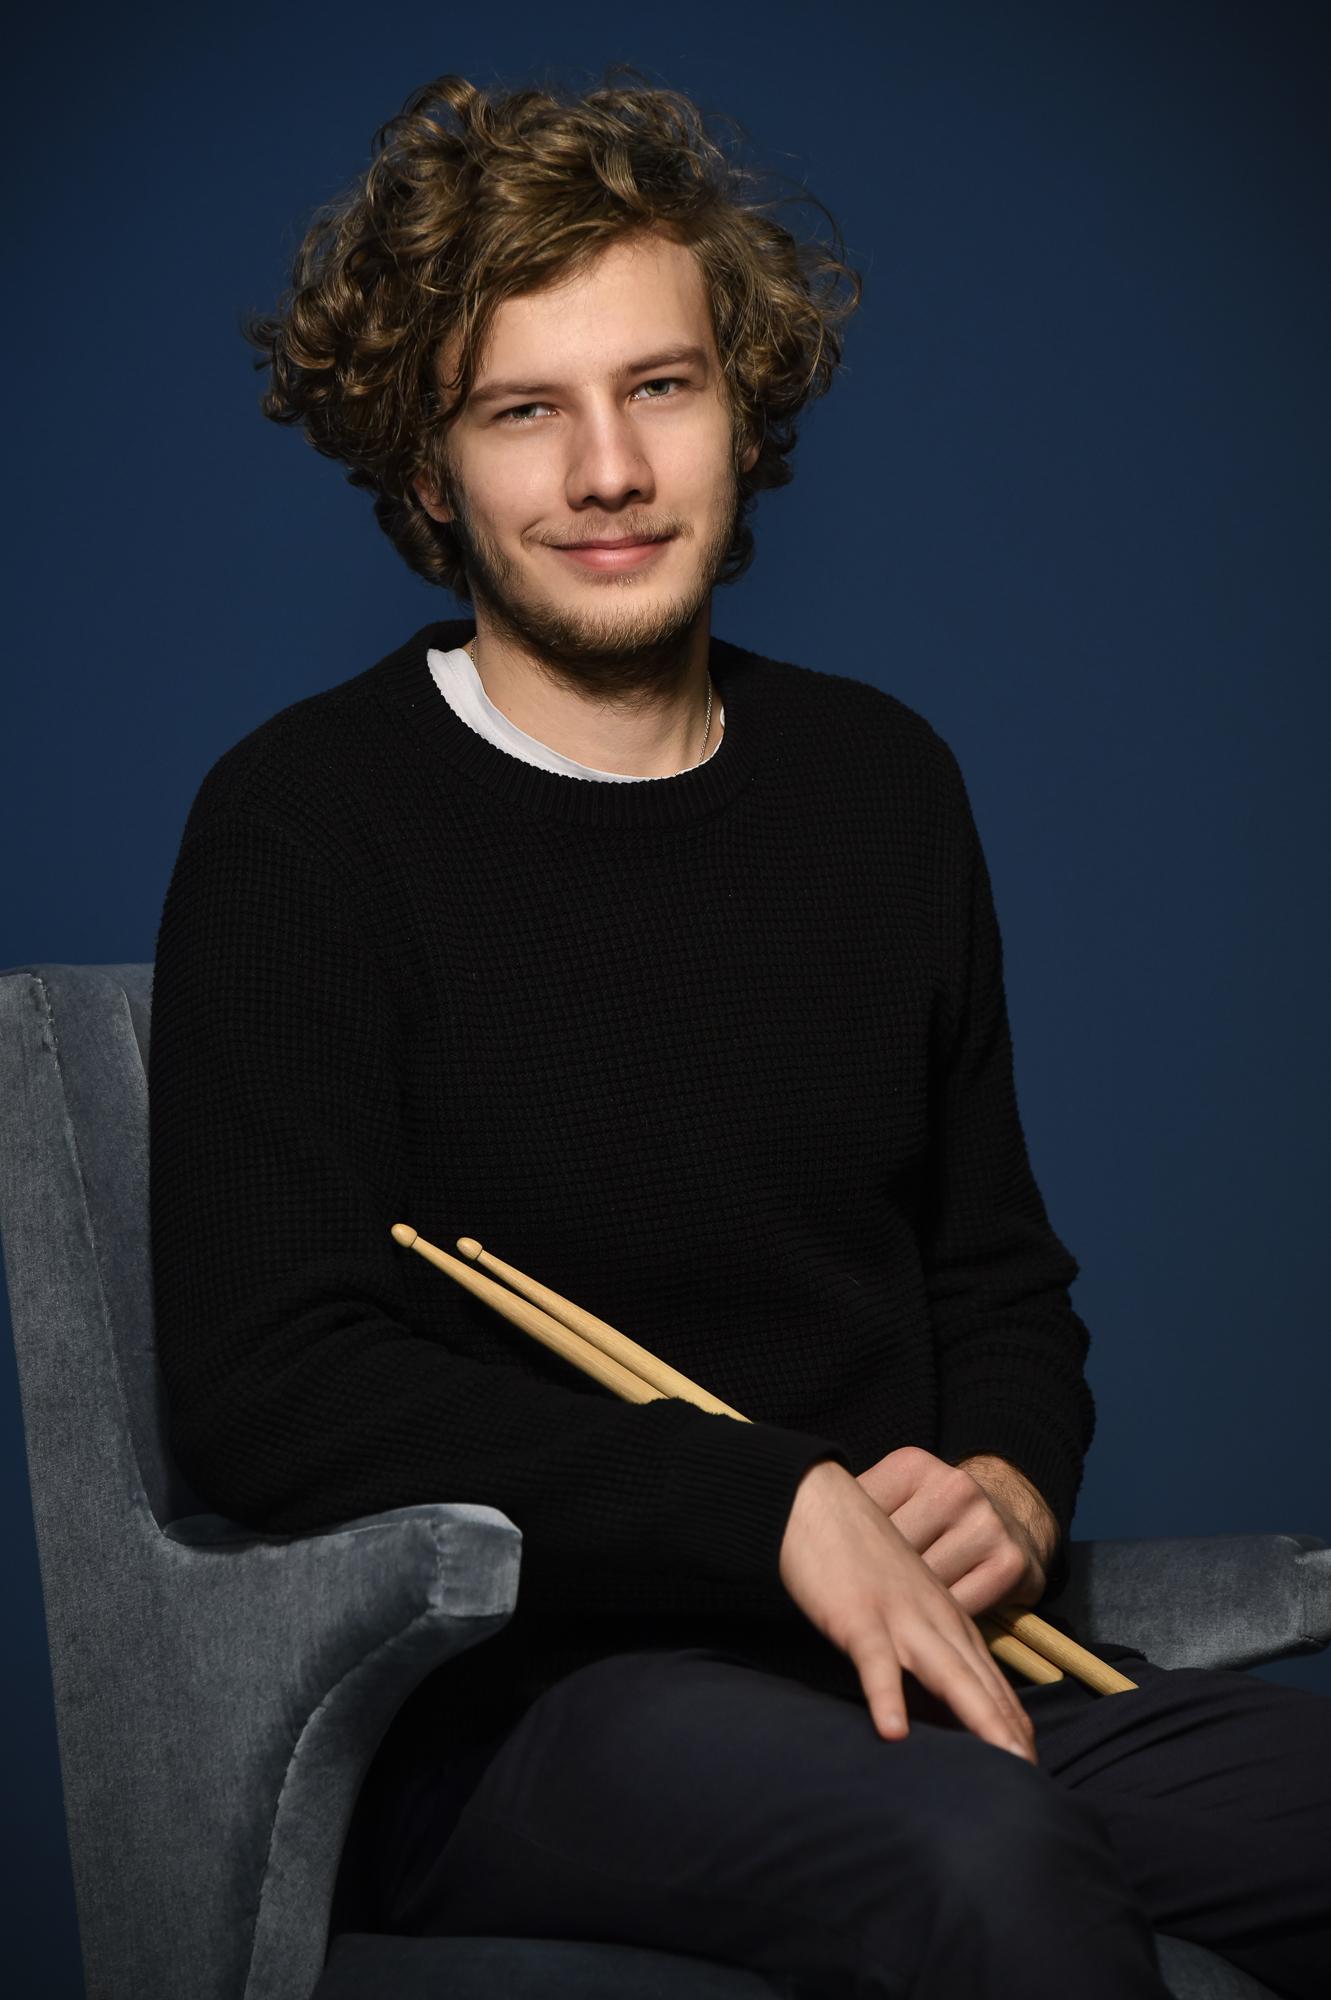 David Paša